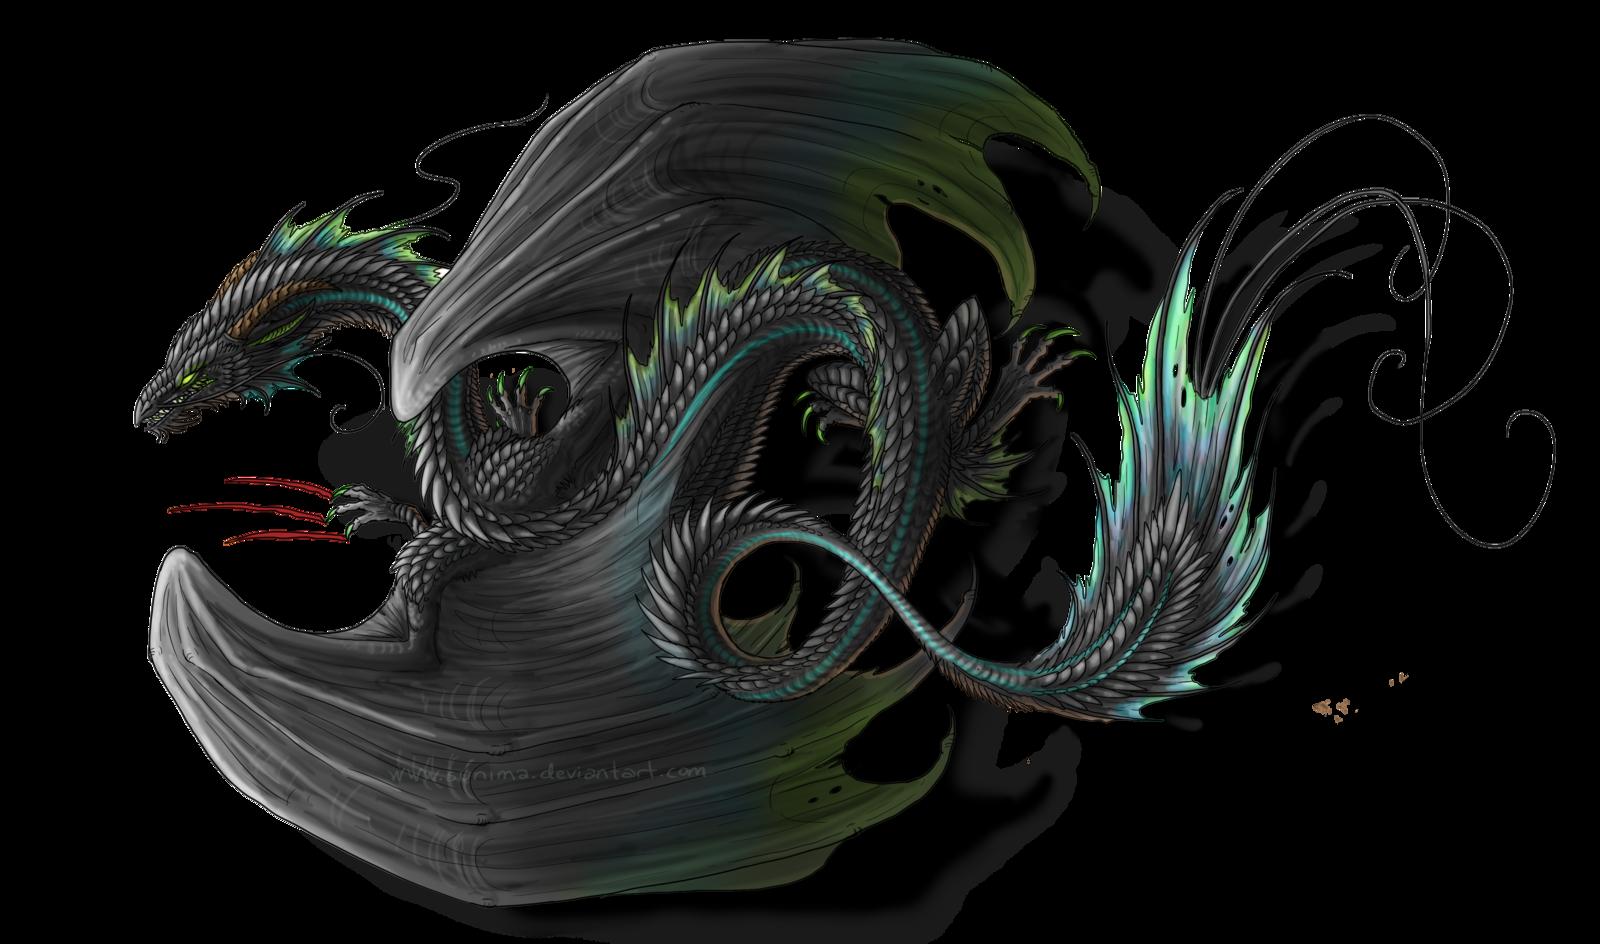 Black Dragon Tattoo by Sunima.deviantart.com on ...